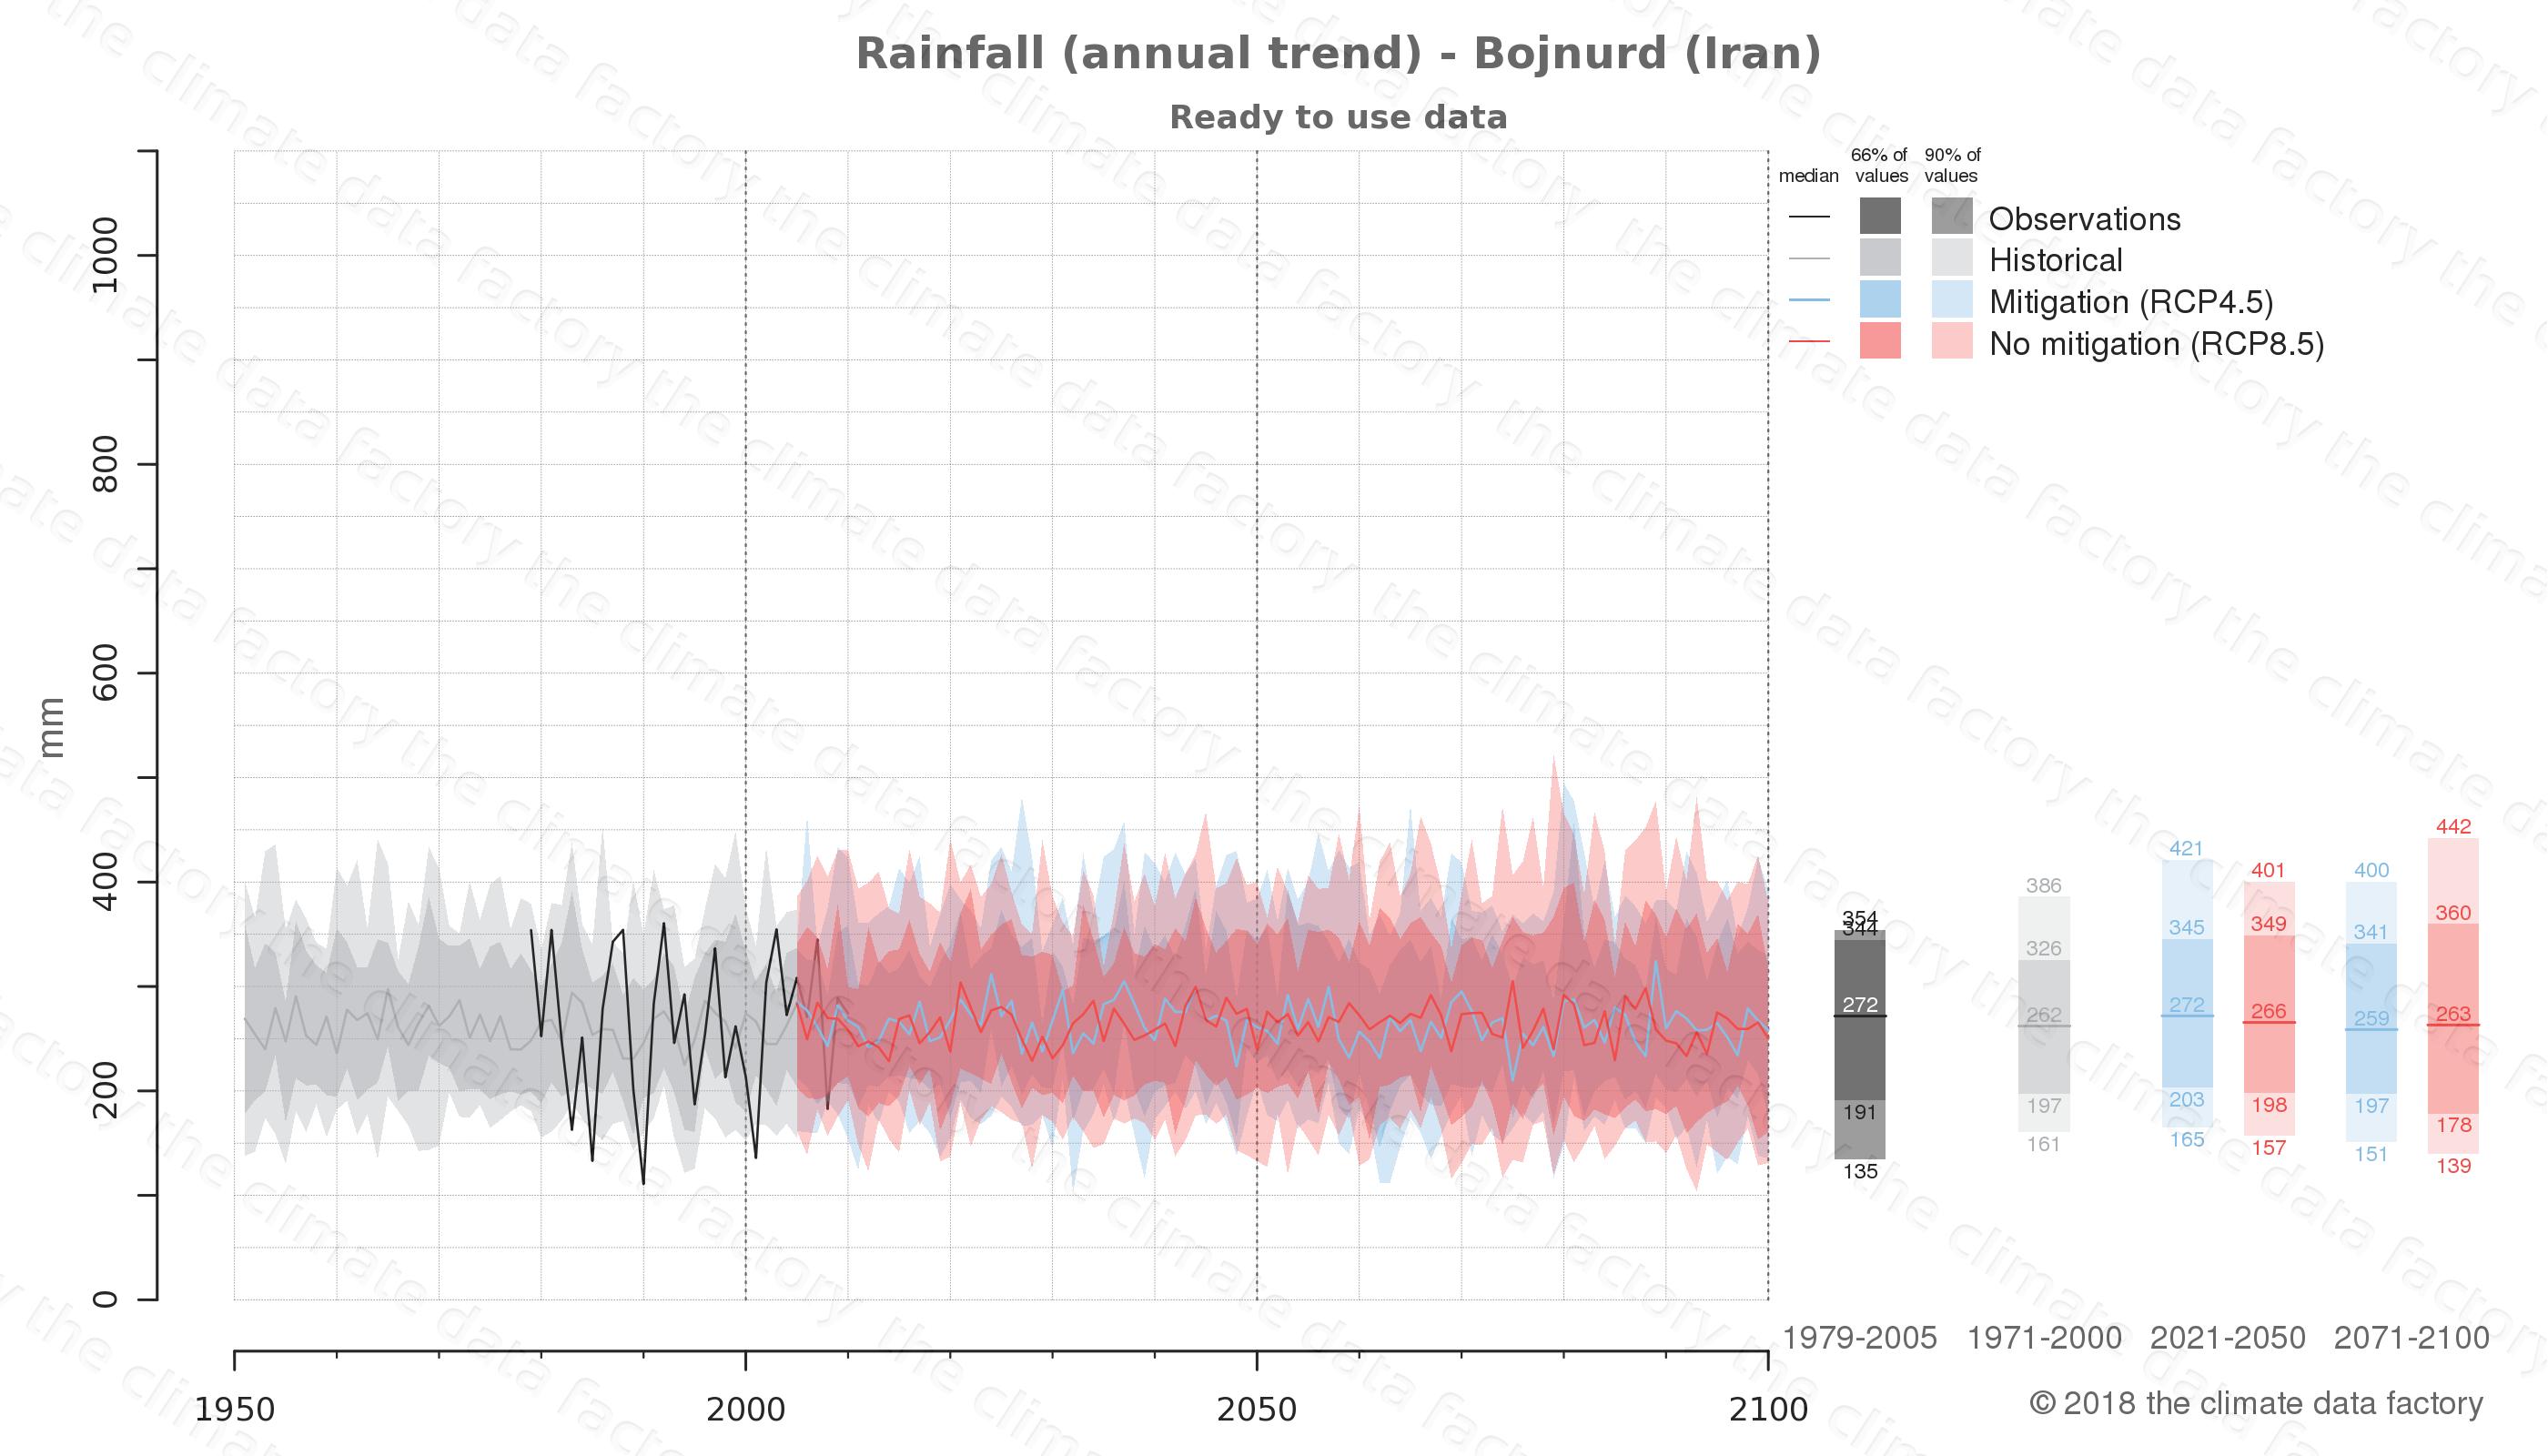 climate change data policy adaptation climate graph city data rainfall bojnurd iran